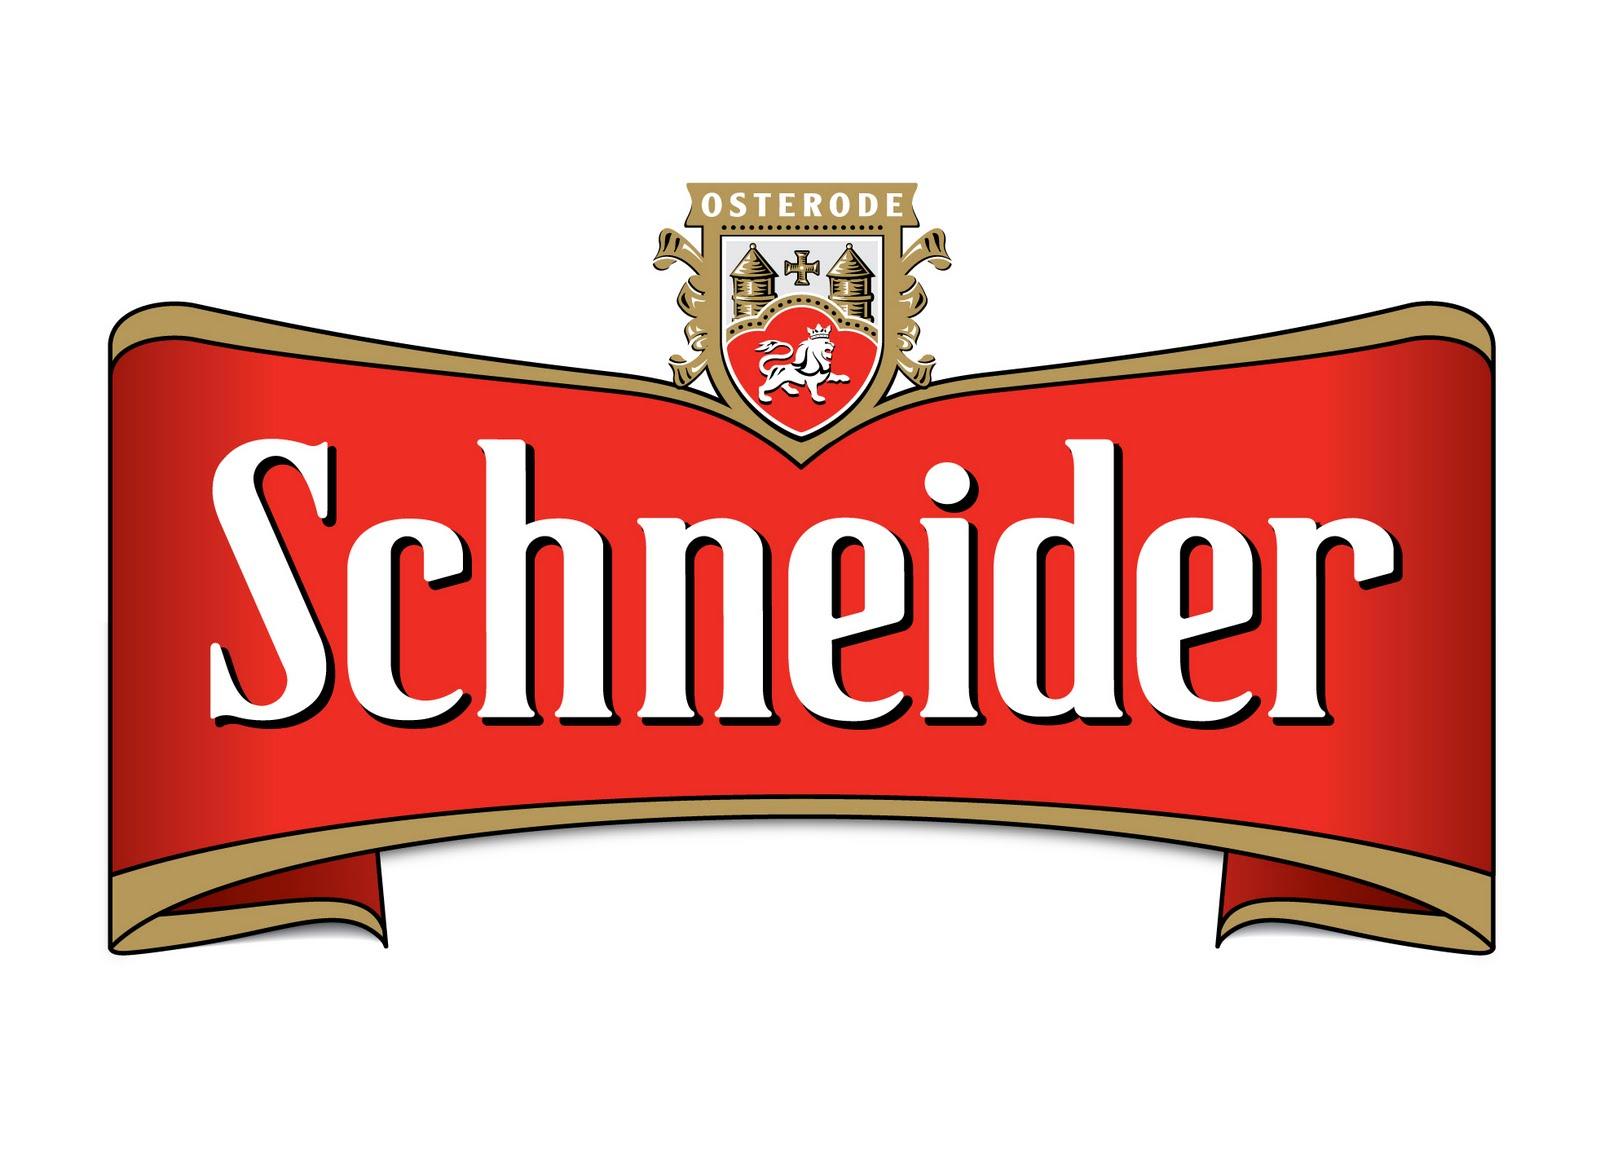 Cerveza Schneider logotipo 0